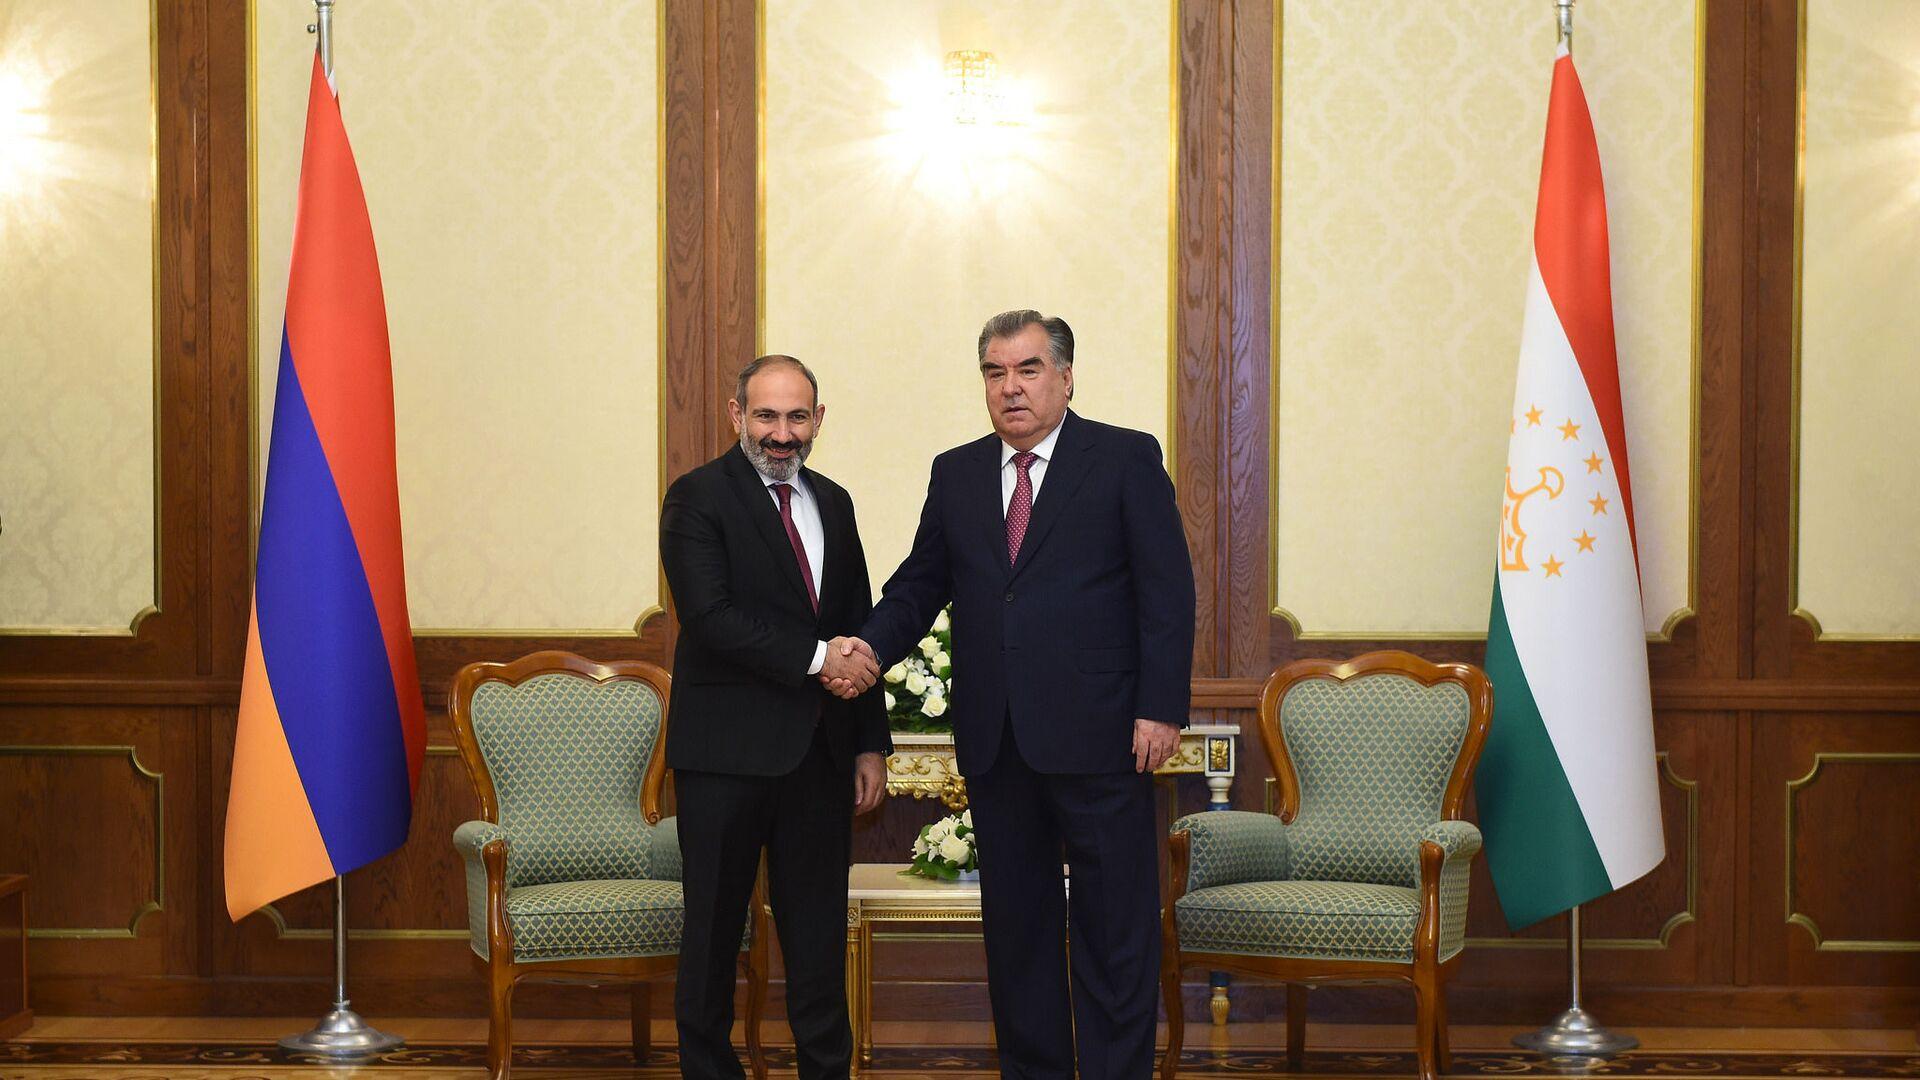 Президент Таджикистана Эмомали Рахмон и премьер-министр Армении Никол Пашинян - Sputnik Таджикистан, 1920, 04.08.2021